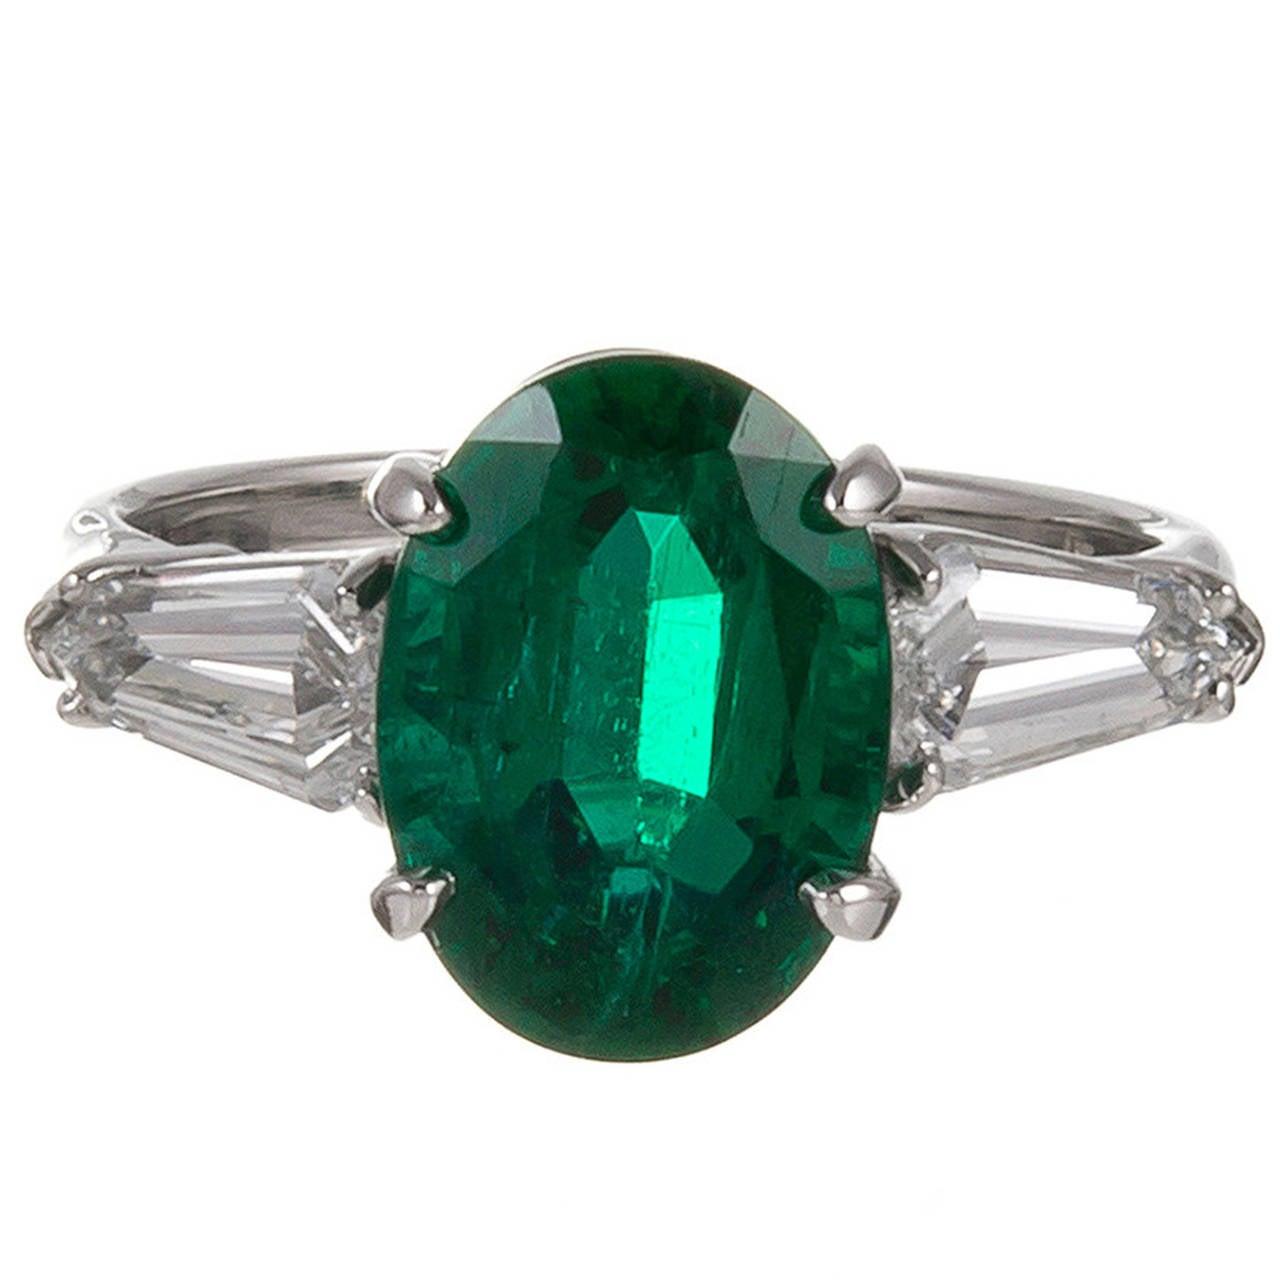 id j wedding ring Elegant 3 49 Carat Oval Emerald Kite Diamond Shoulders Platinum Engagement Ring 1